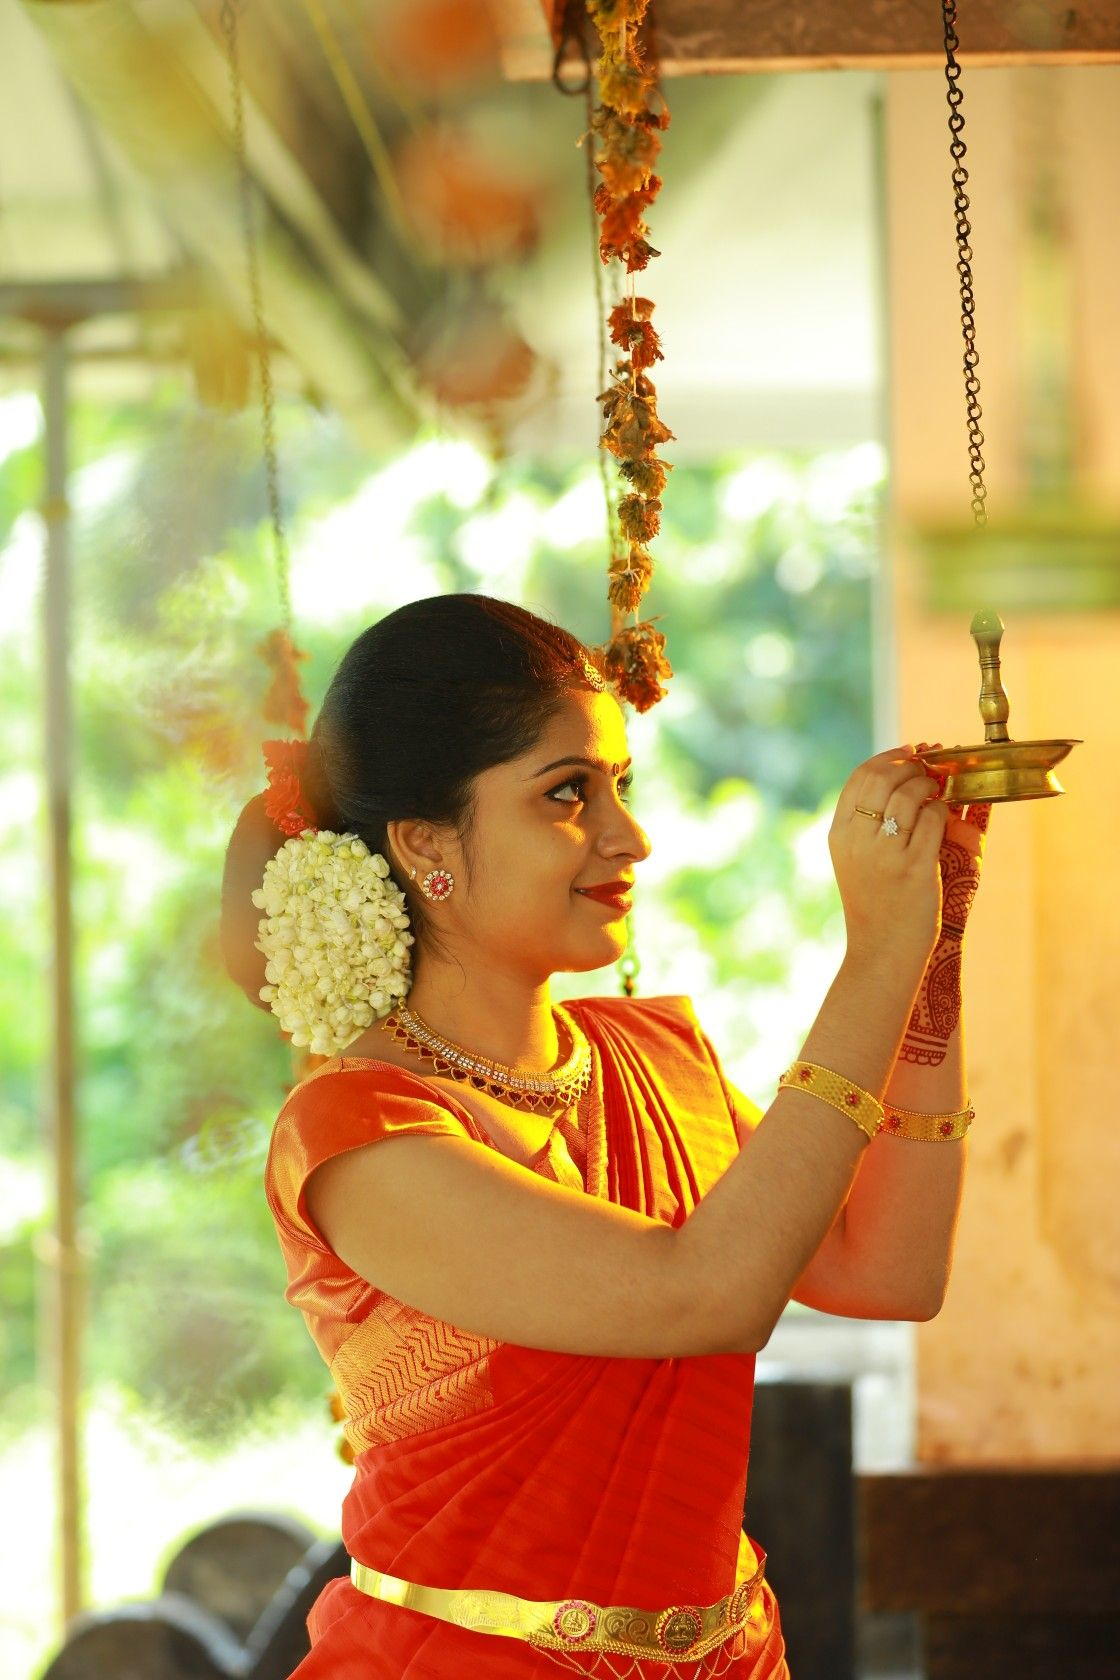 Pin By A On Rajaji Saree Wedding Bridal Jewellery Indian South Indian Wedding Hairstyles